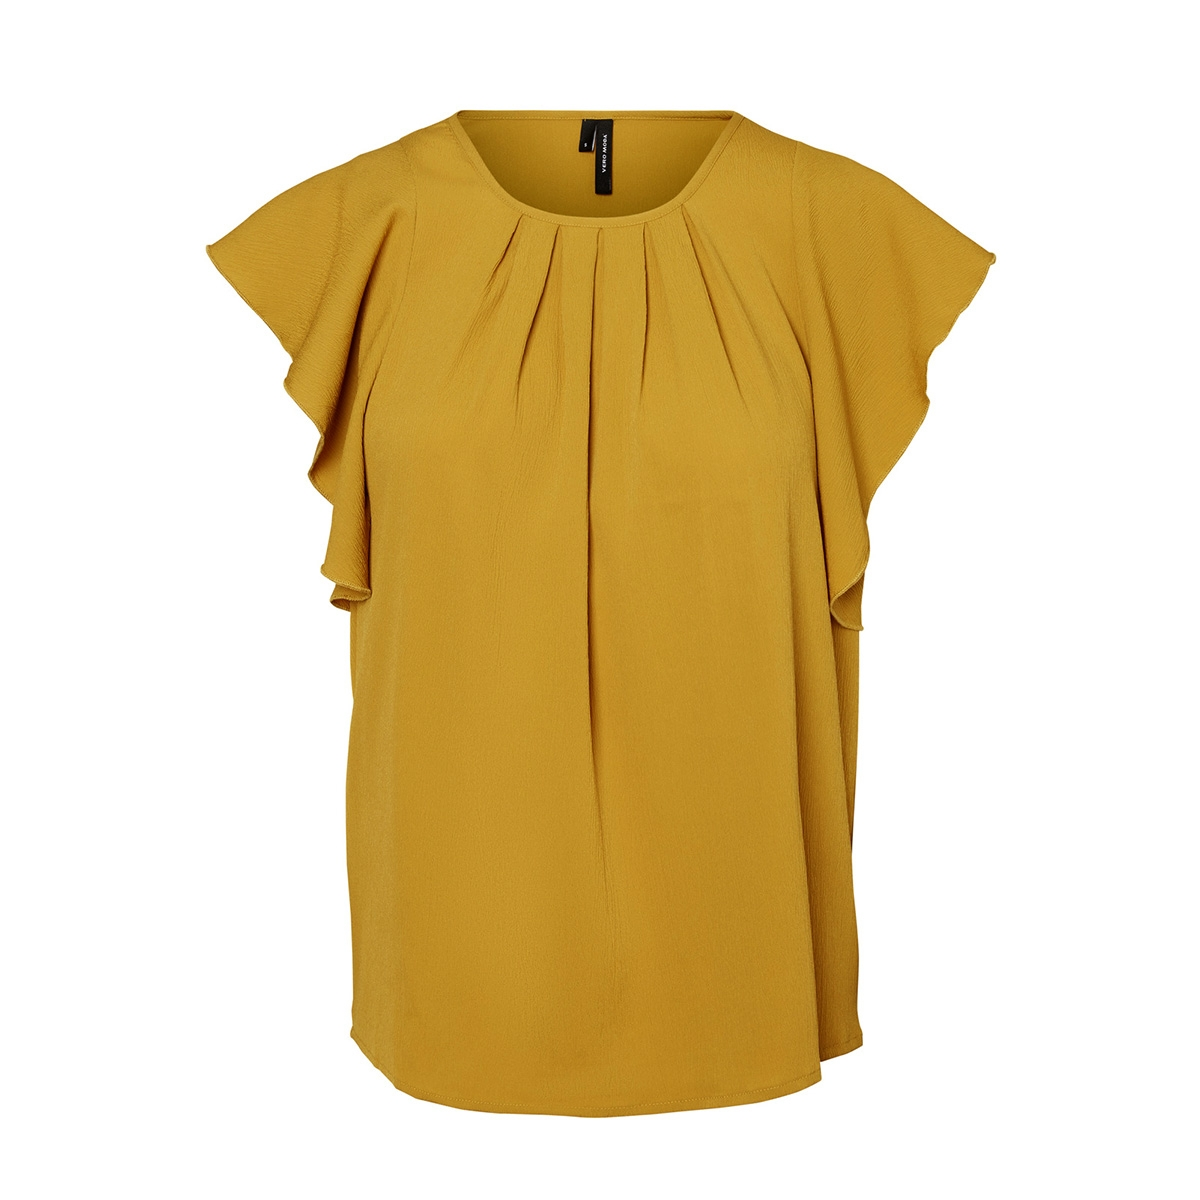 vmnewyork frill s/l top  sb8 10195068 vero moda t-shirt harvest gold